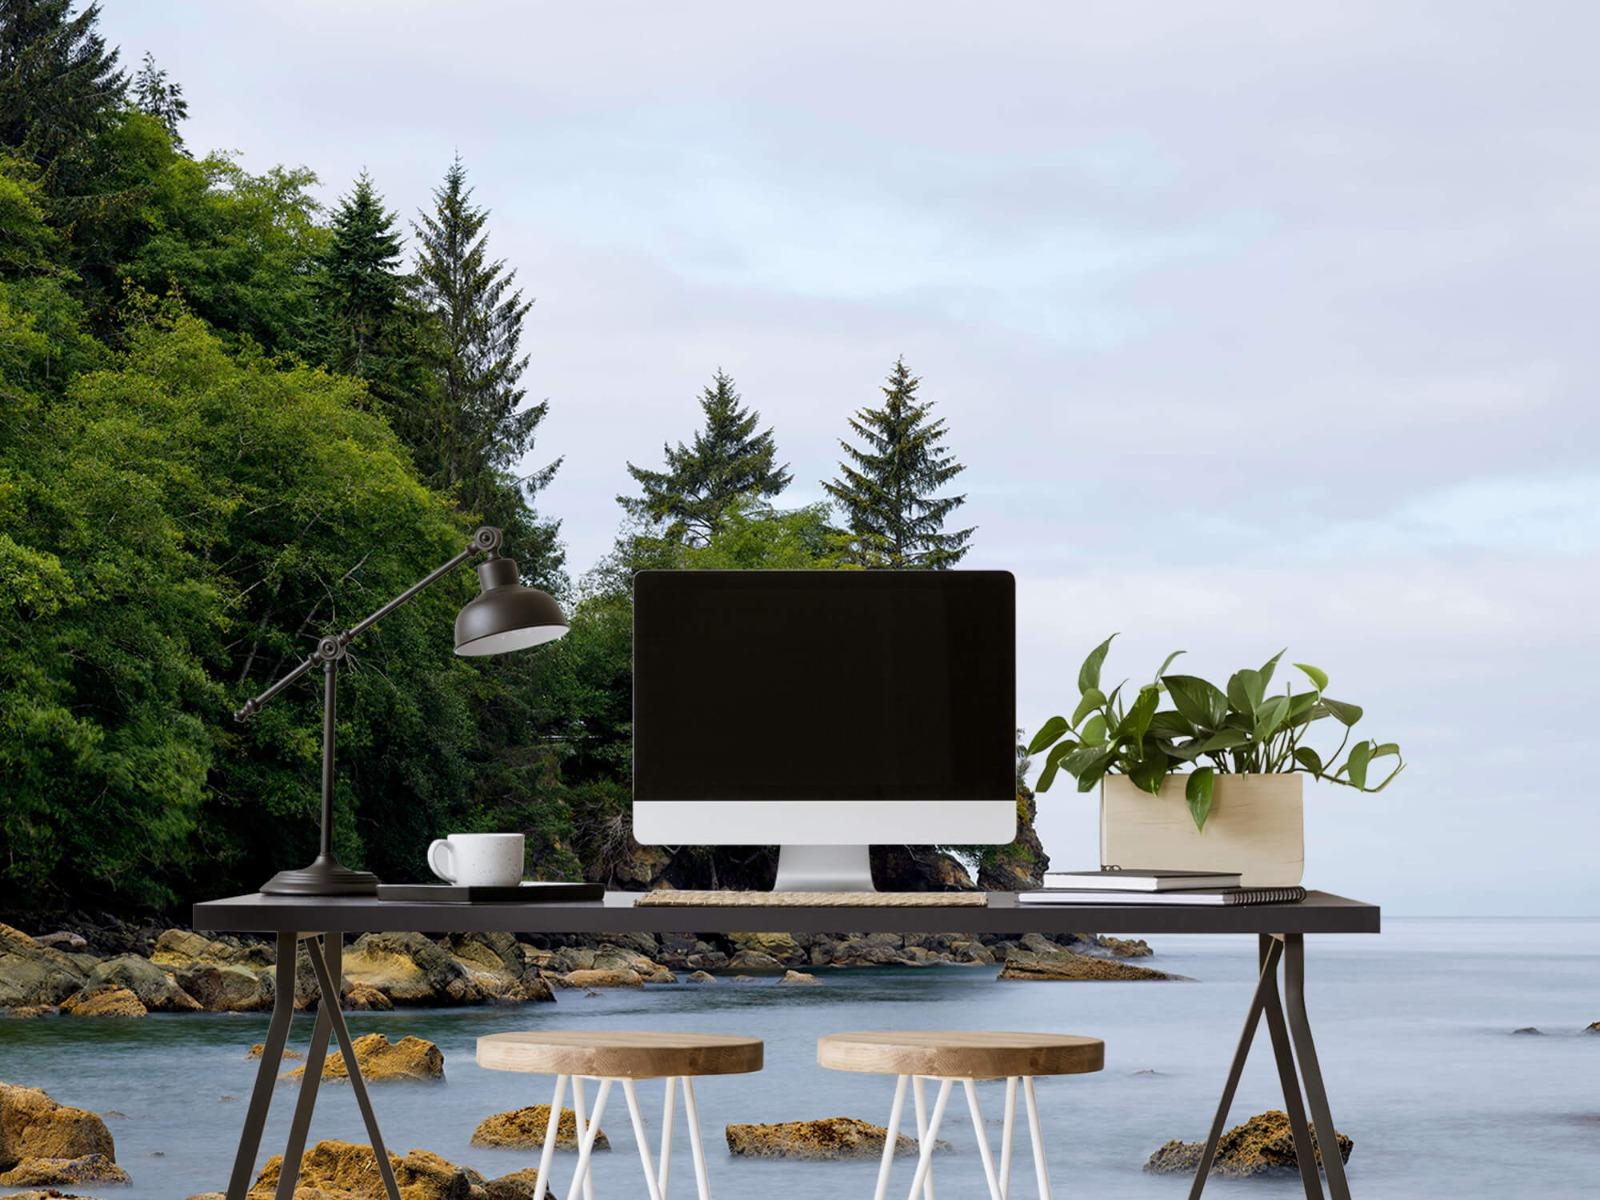 Bomen - Ruwe kustlijn - Slaapkamer 2